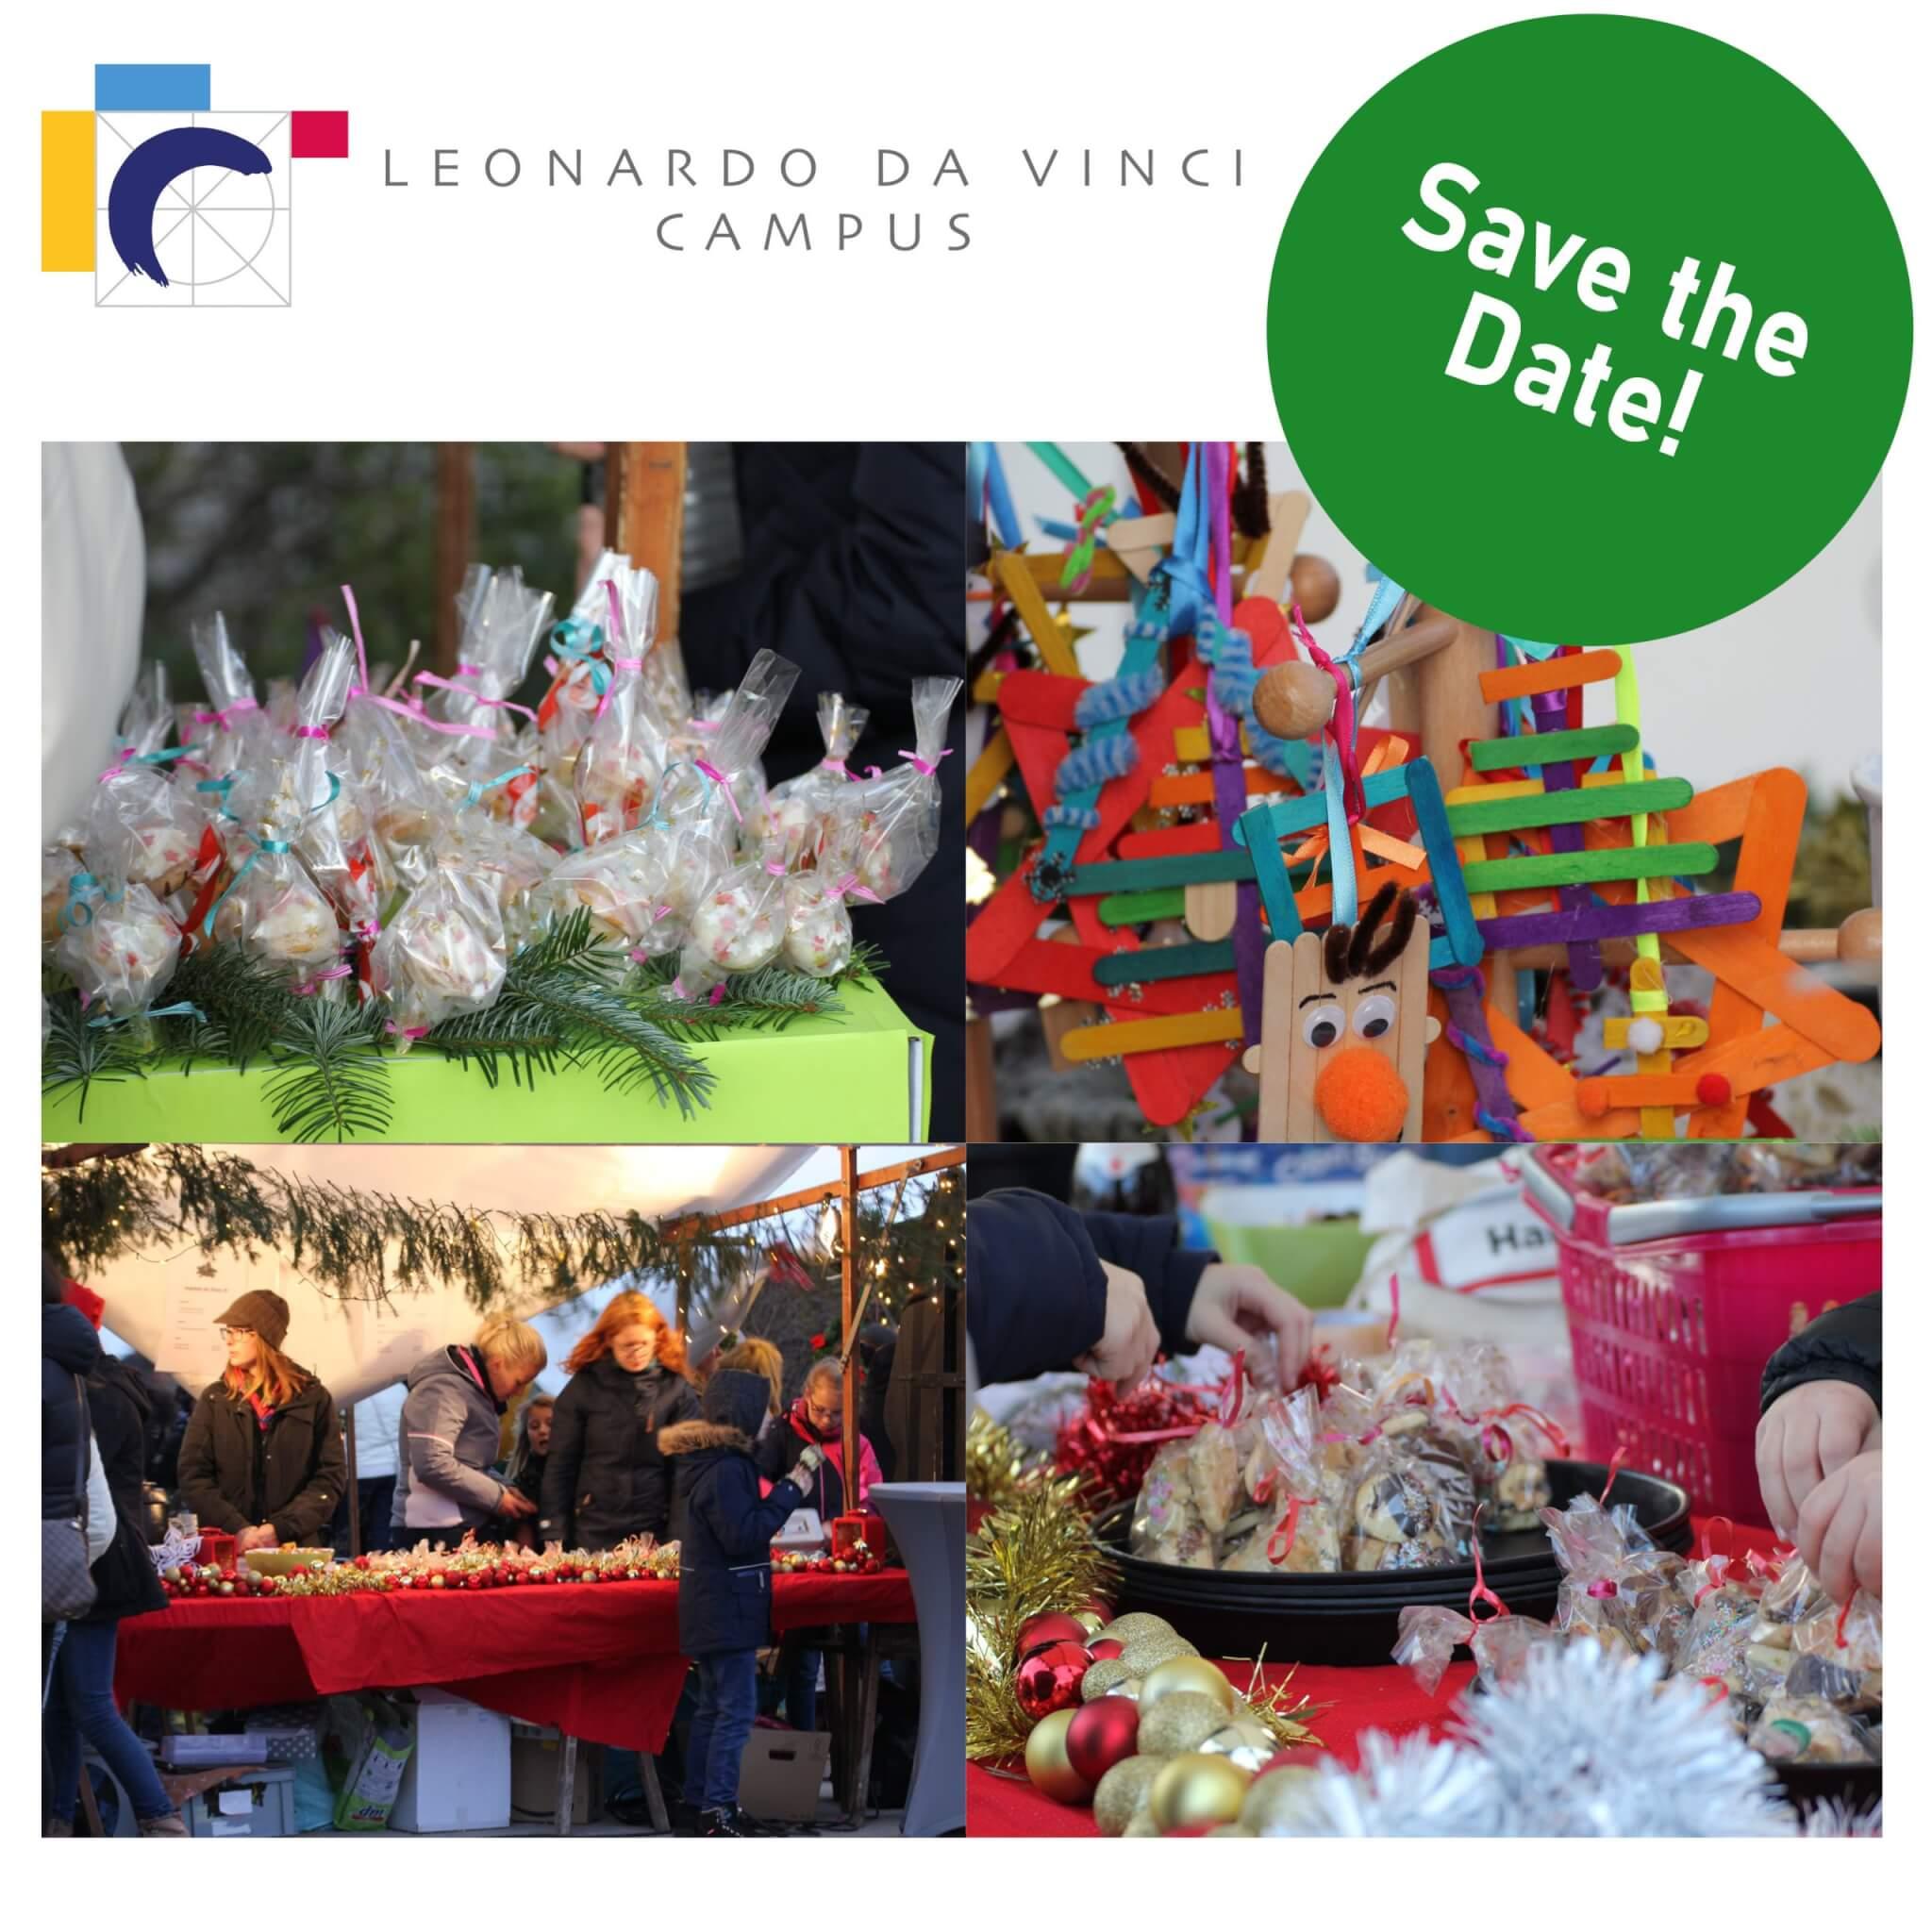 Adventsbasar Einladung Leonardo Da Vinci Campus 25.11.21